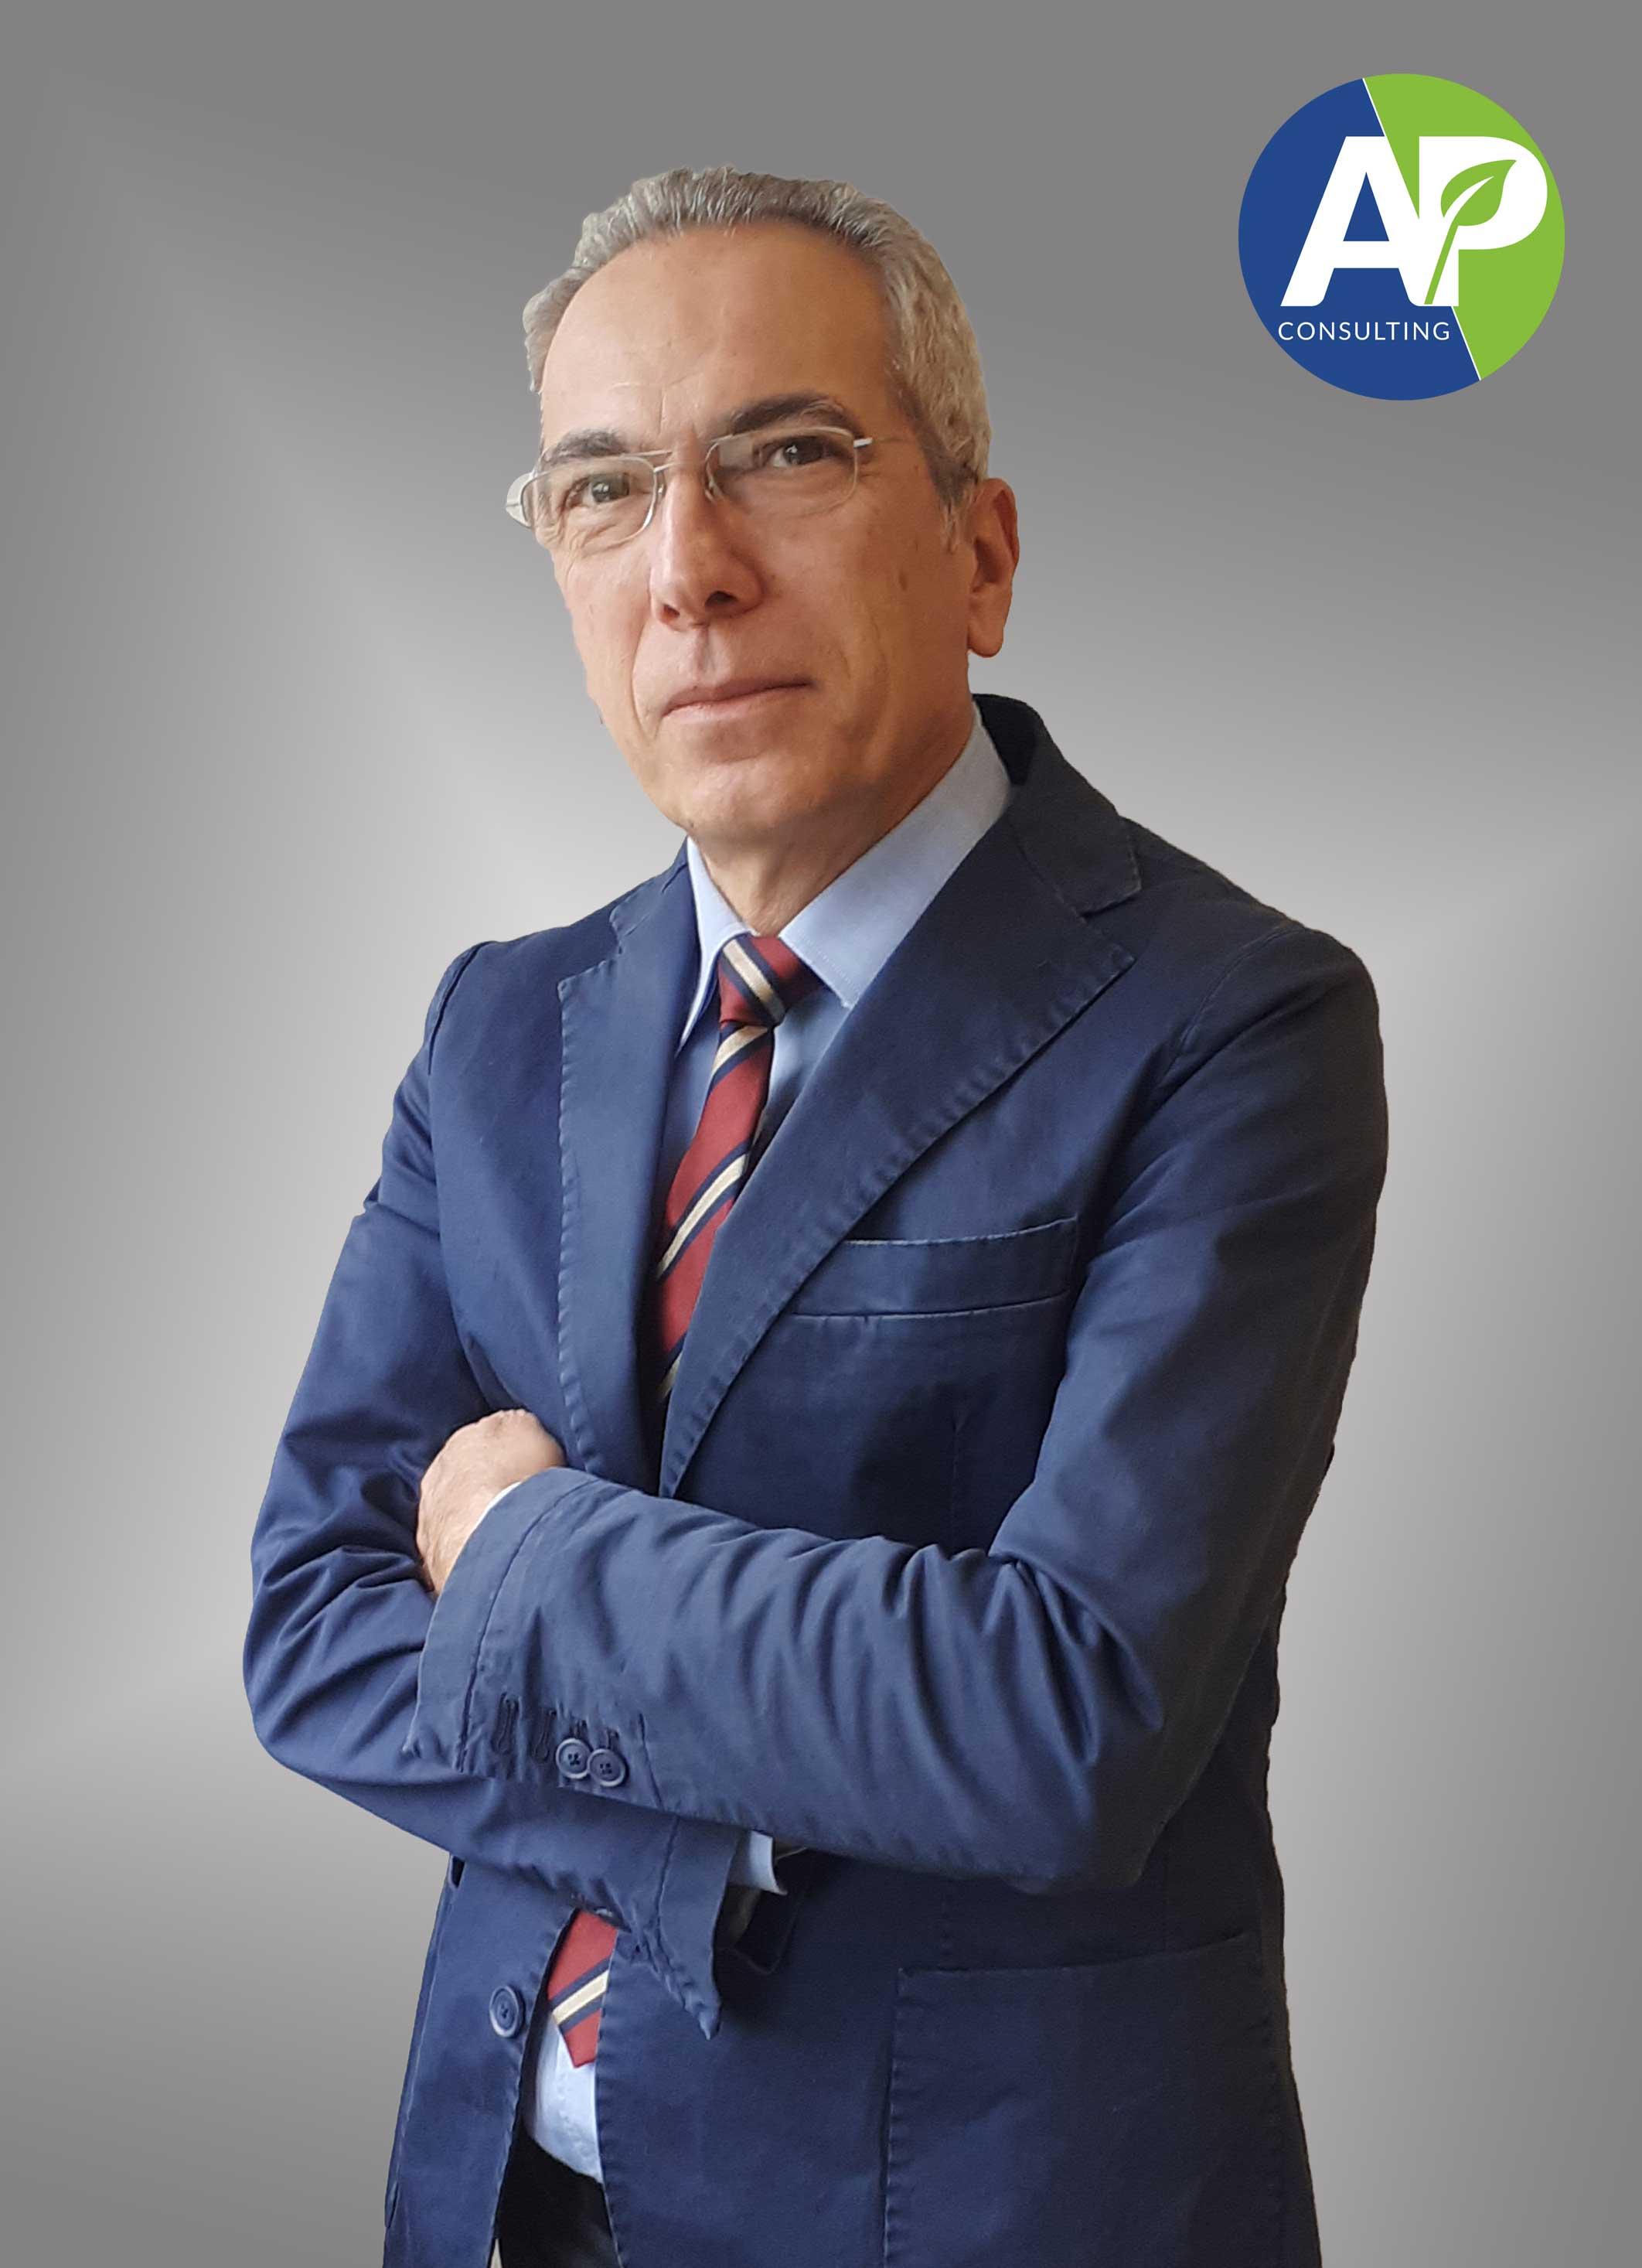 GIOVANNI FERRARI- Responsabile Commerciale AP Consulting srl